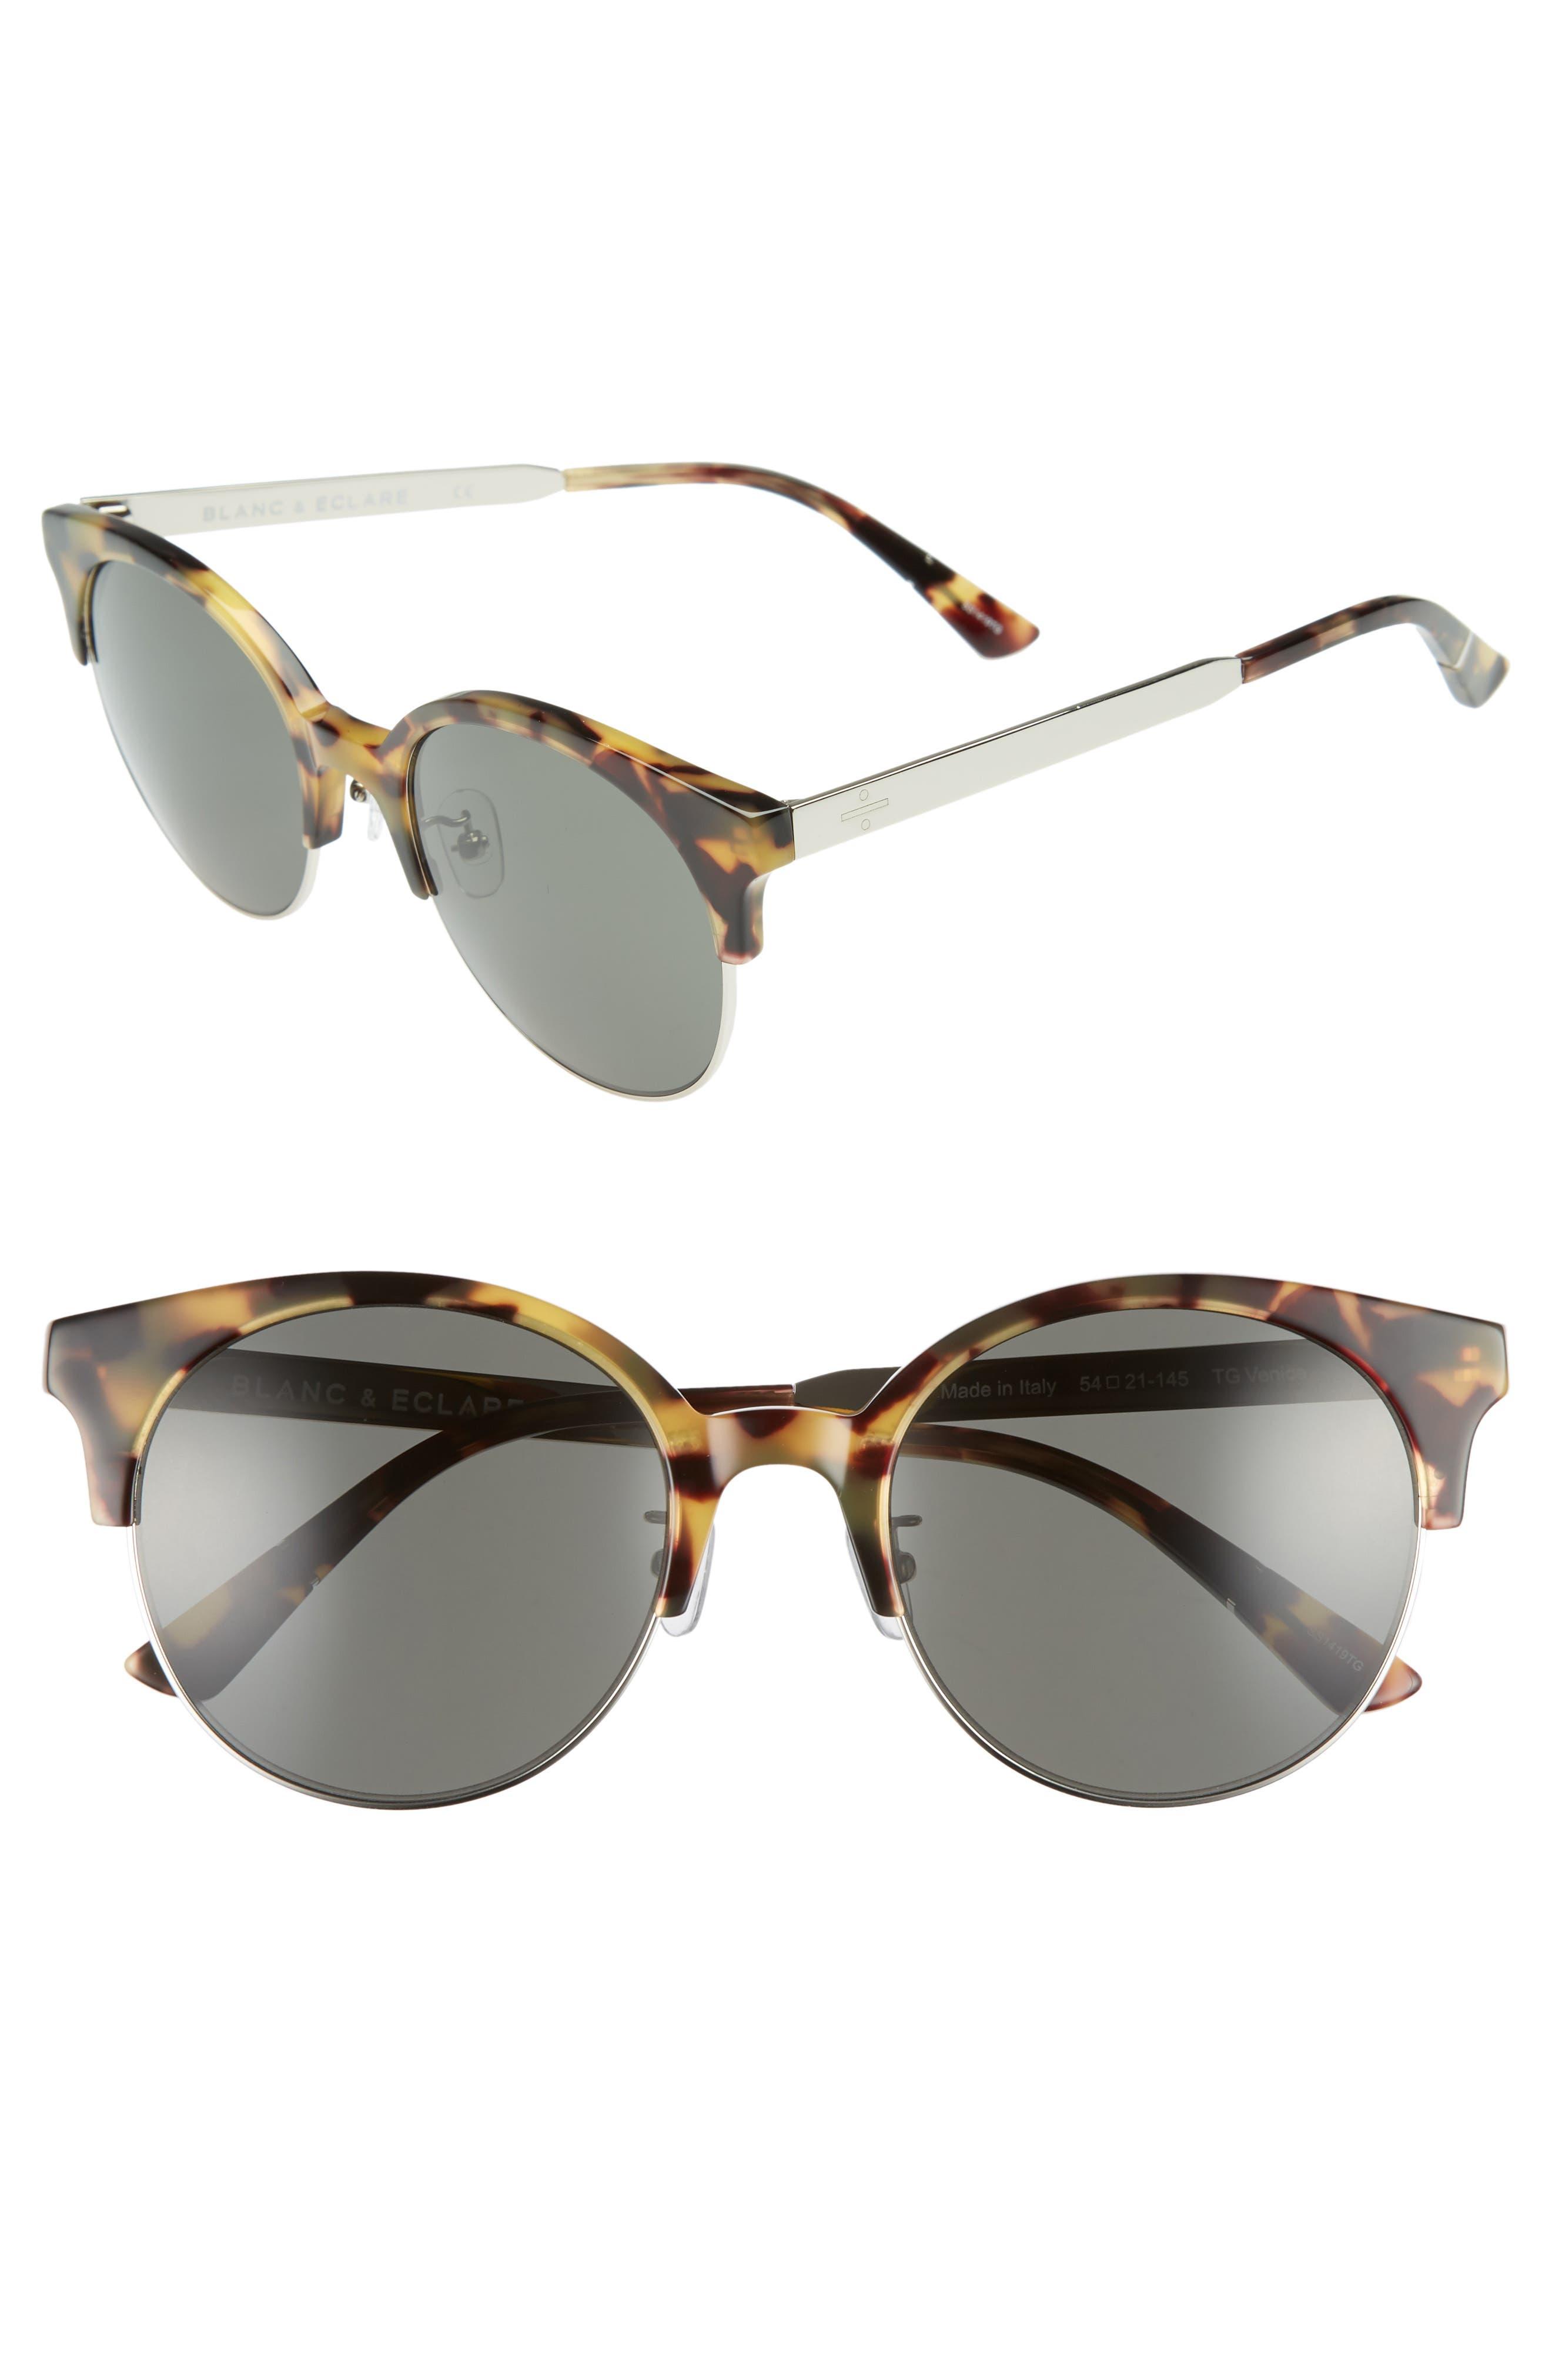 BLANC & ECLARE Venice Round Sunglasses,                             Main thumbnail 2, color,